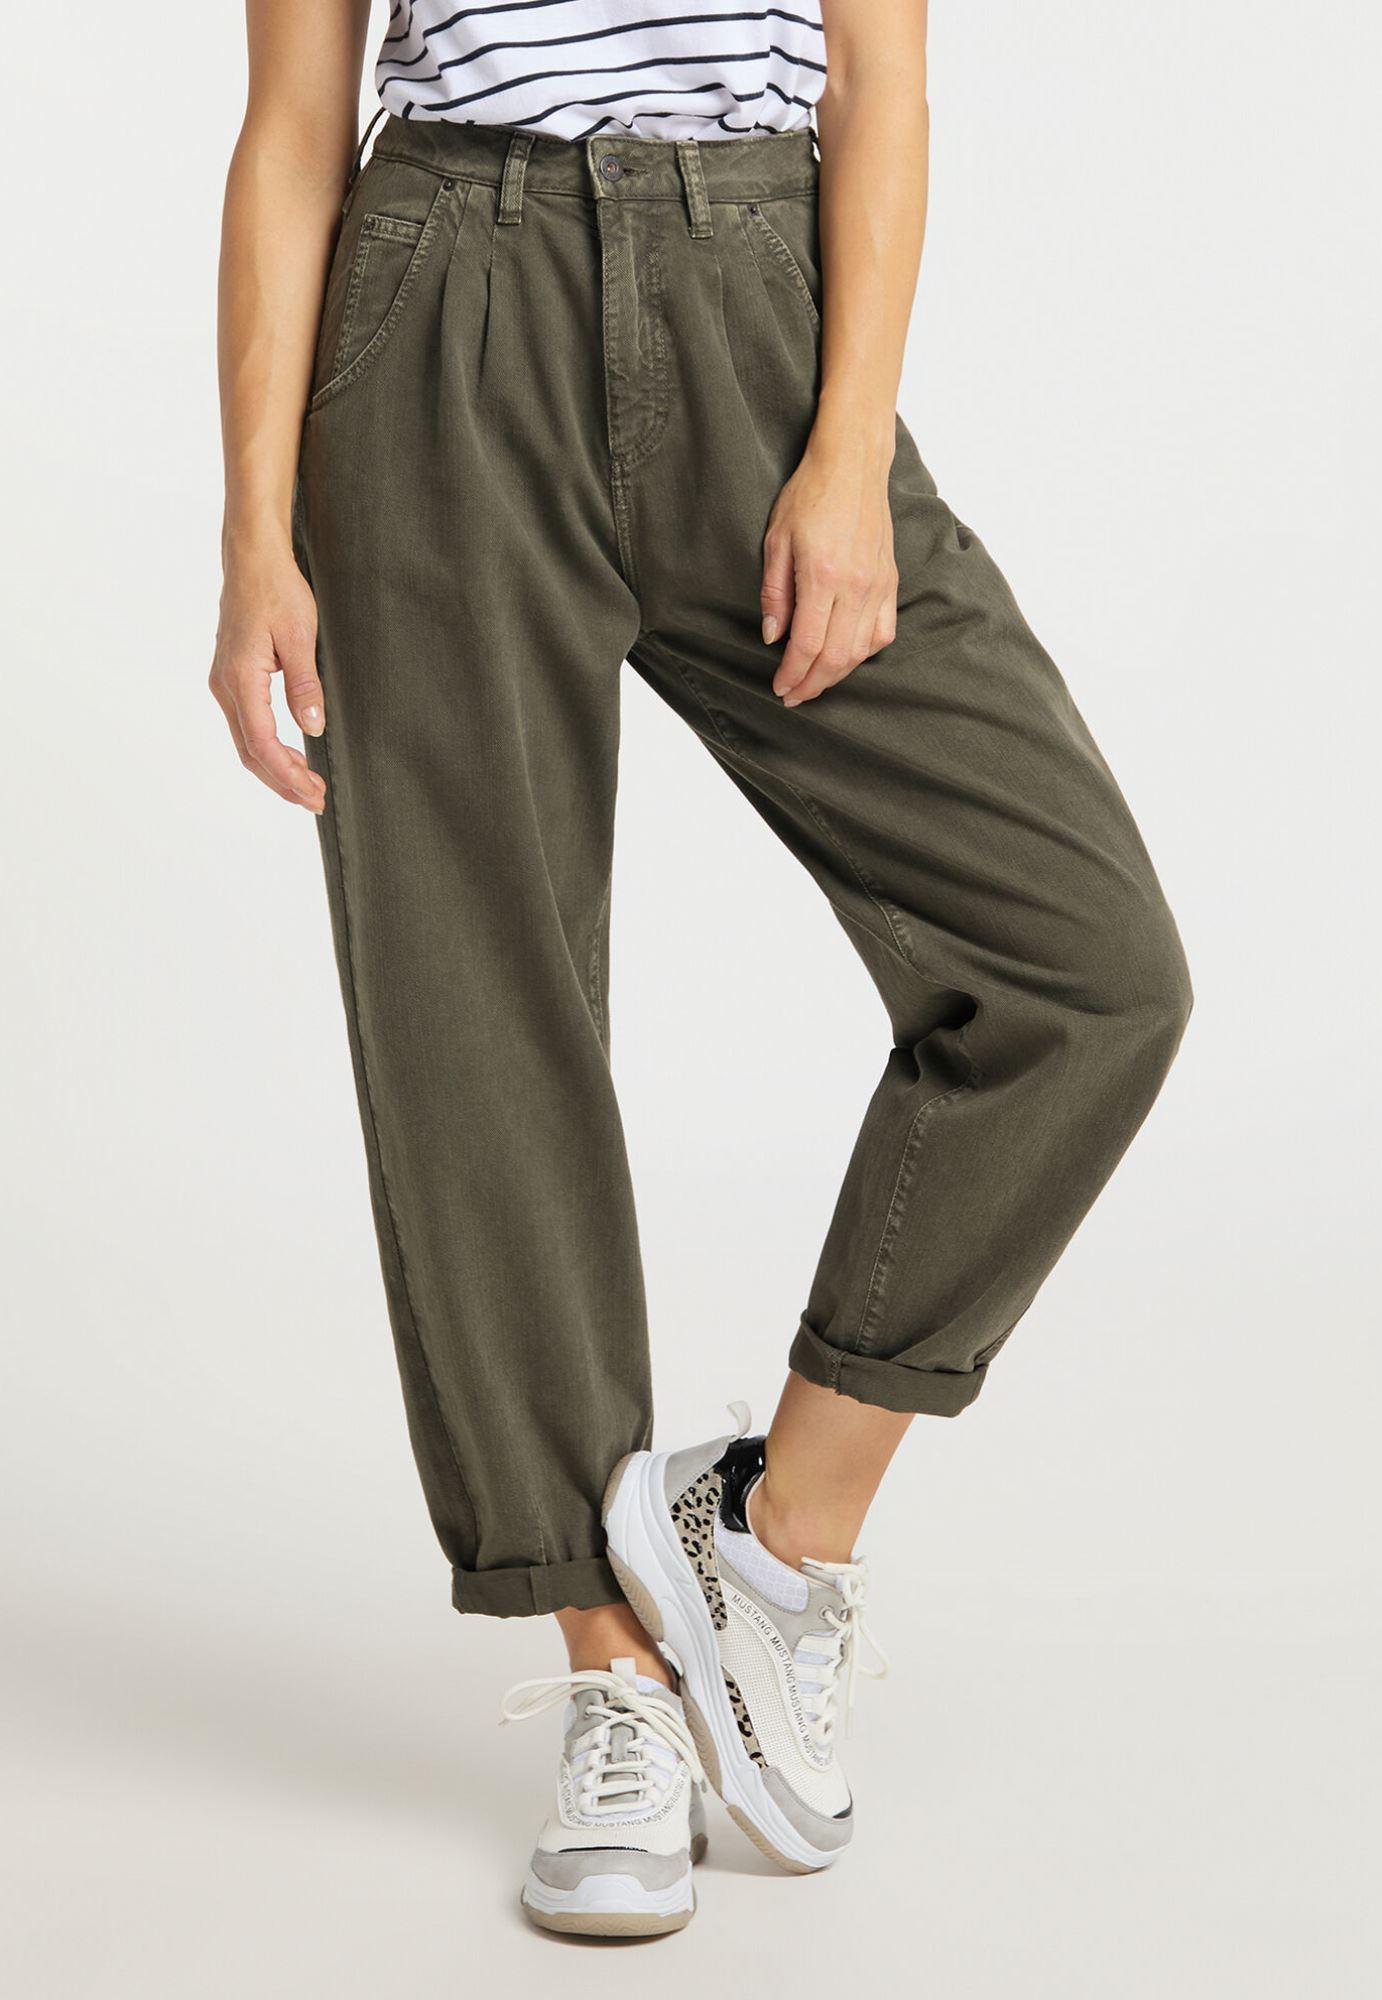 Mustang Barrel Pants Damen Jeans / Comfort Fit / High Rise / Olive